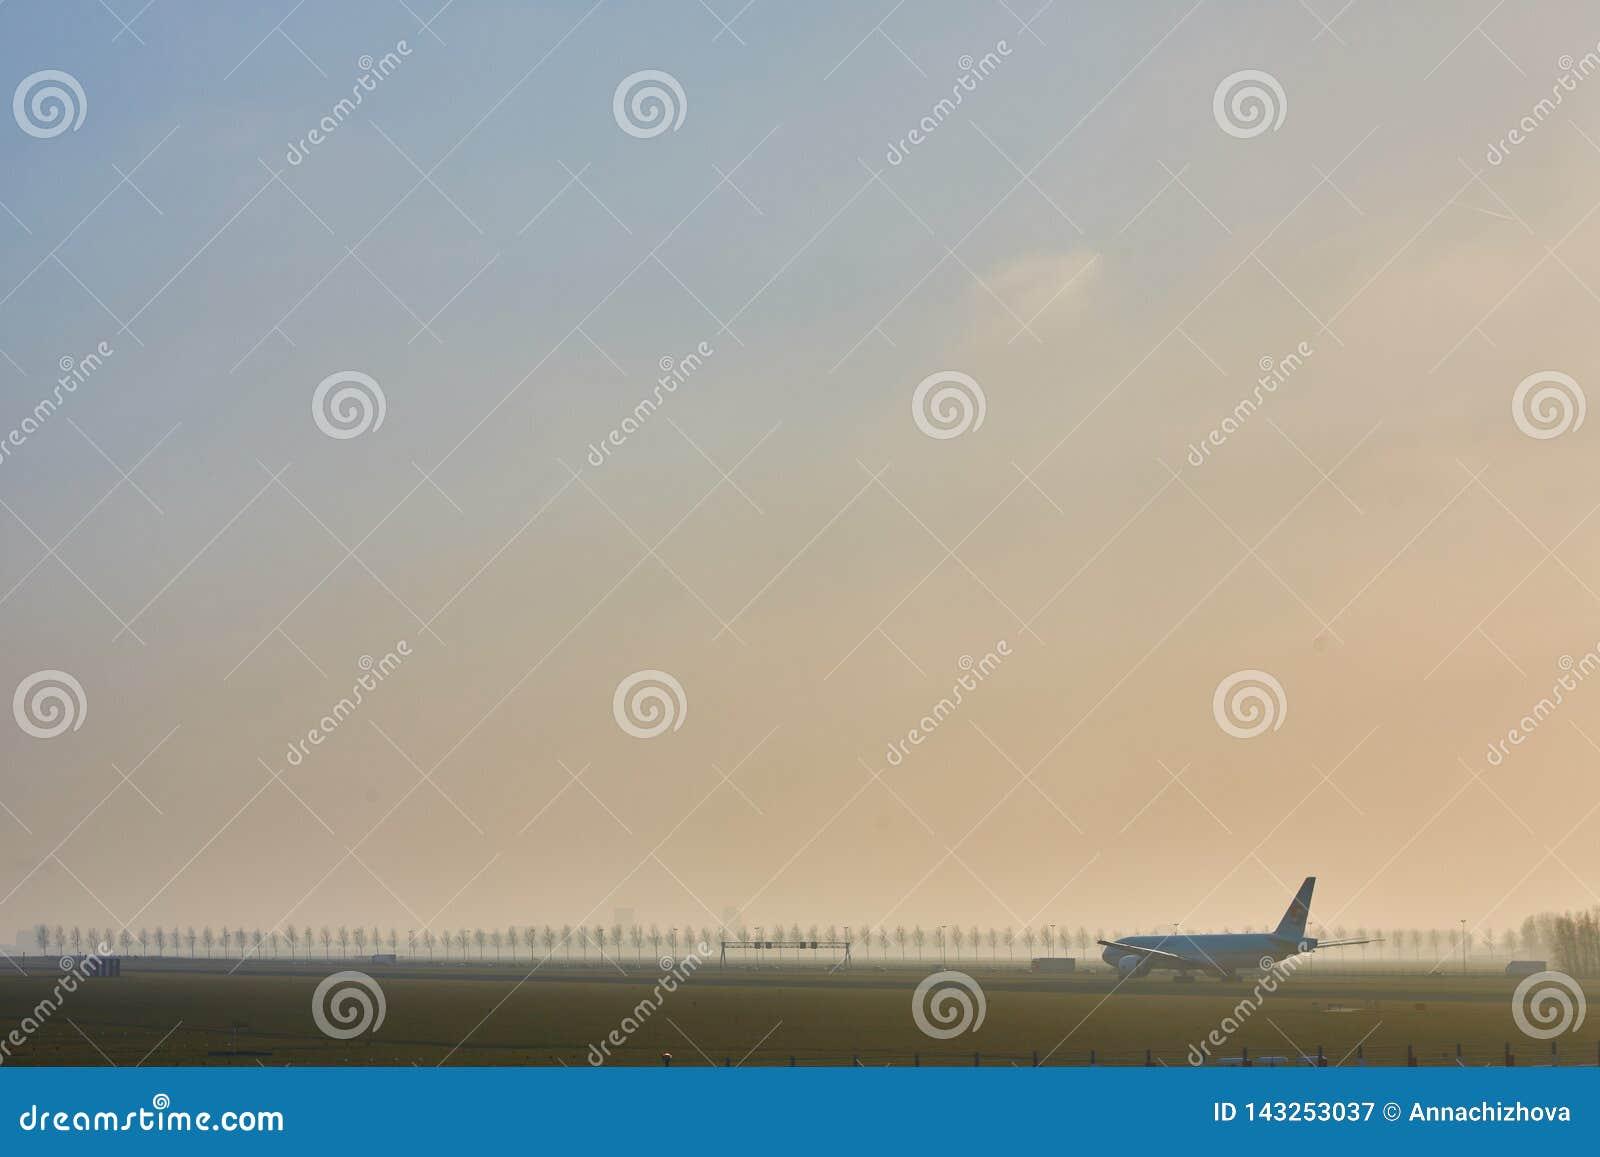 Amsterdam, Nederland - Maart 11, 2016: De Luchthaven Schiphol van Amsterdam in Nederland AMS is de leiding van Nederland